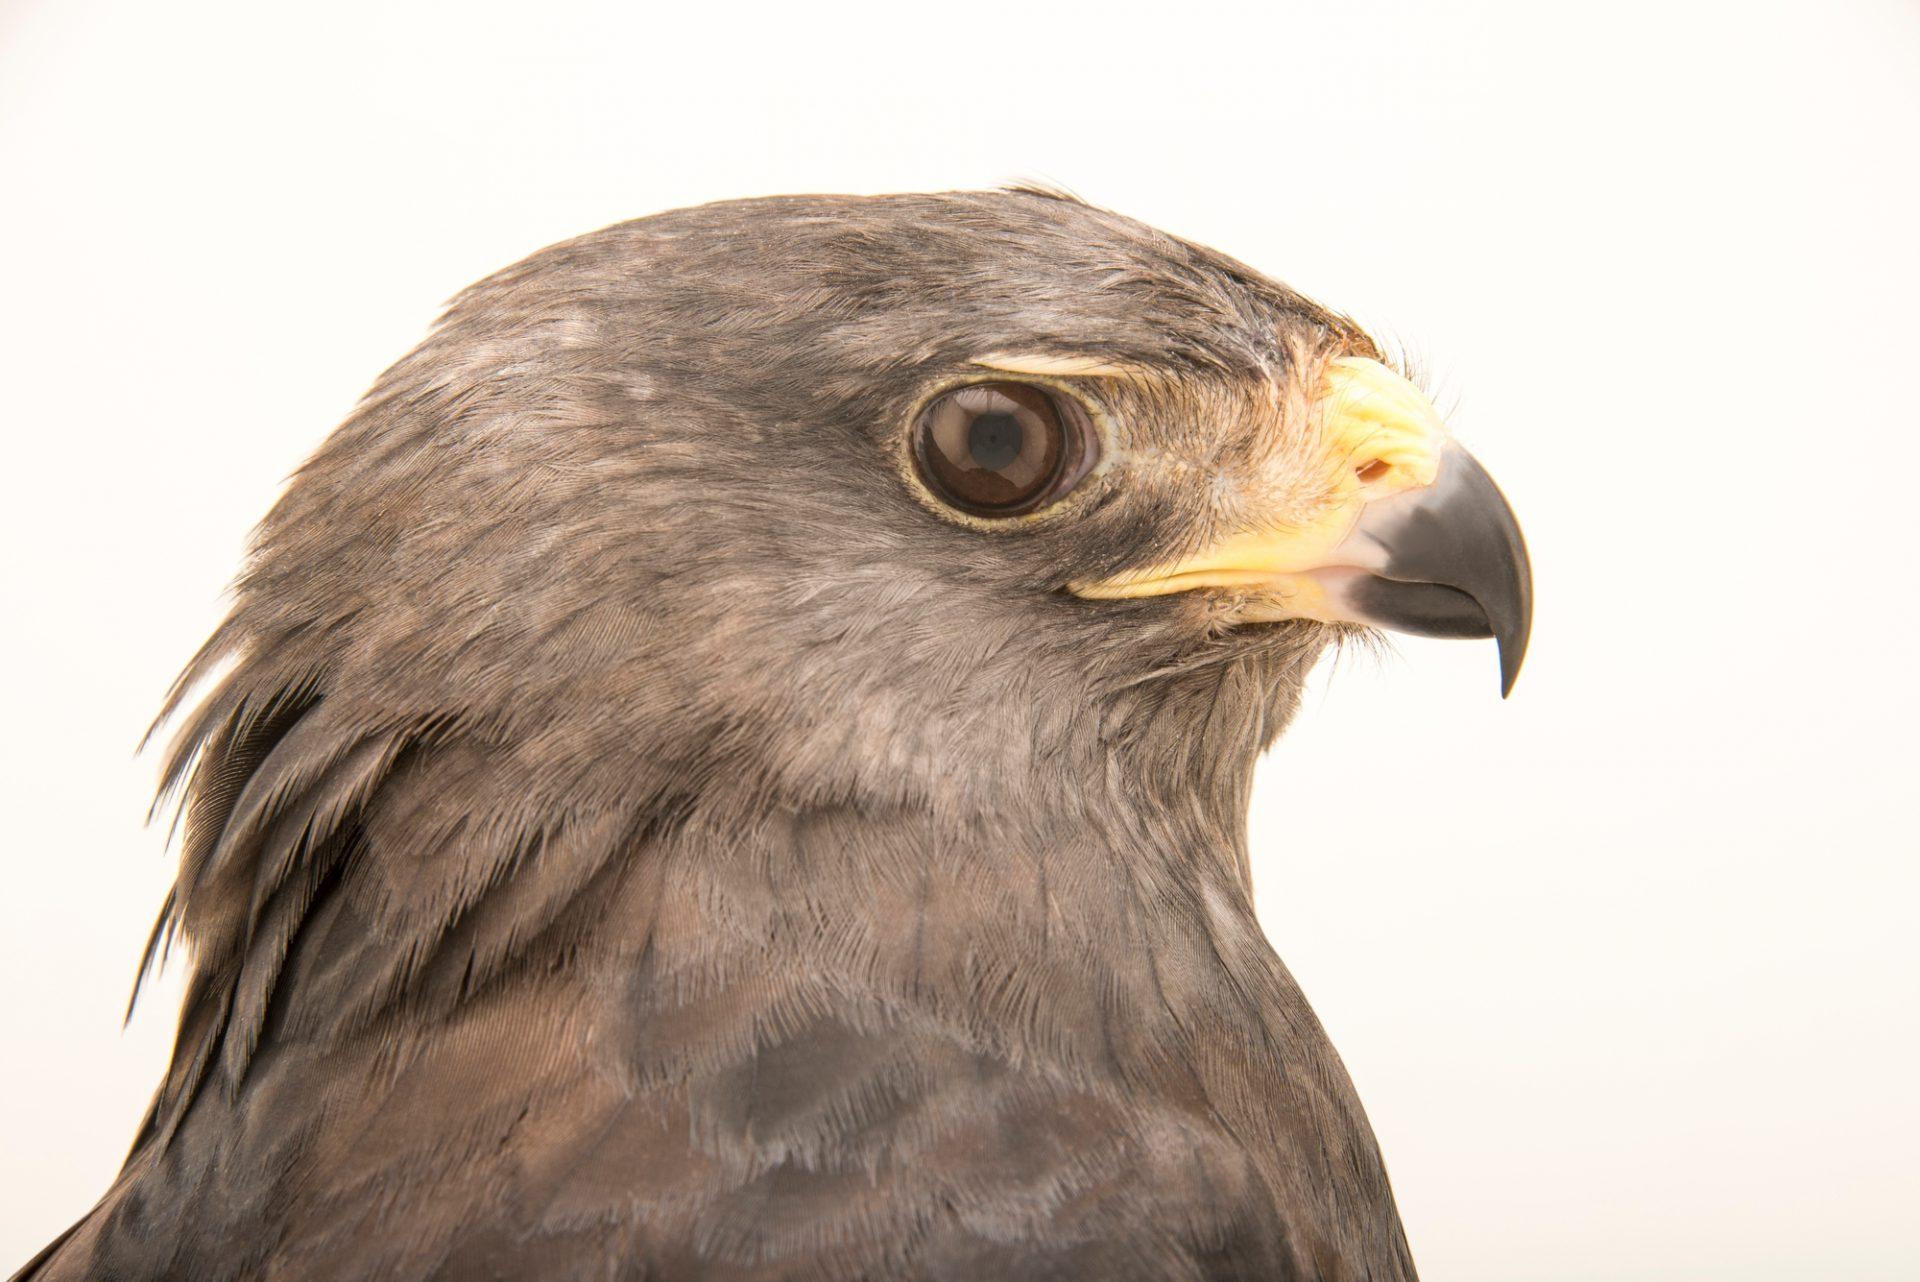 Photo: A zone-tailed hawk (Buteo albonotatus) at SIA, the Comanche Nation Ethno-Ornithological Initiative.